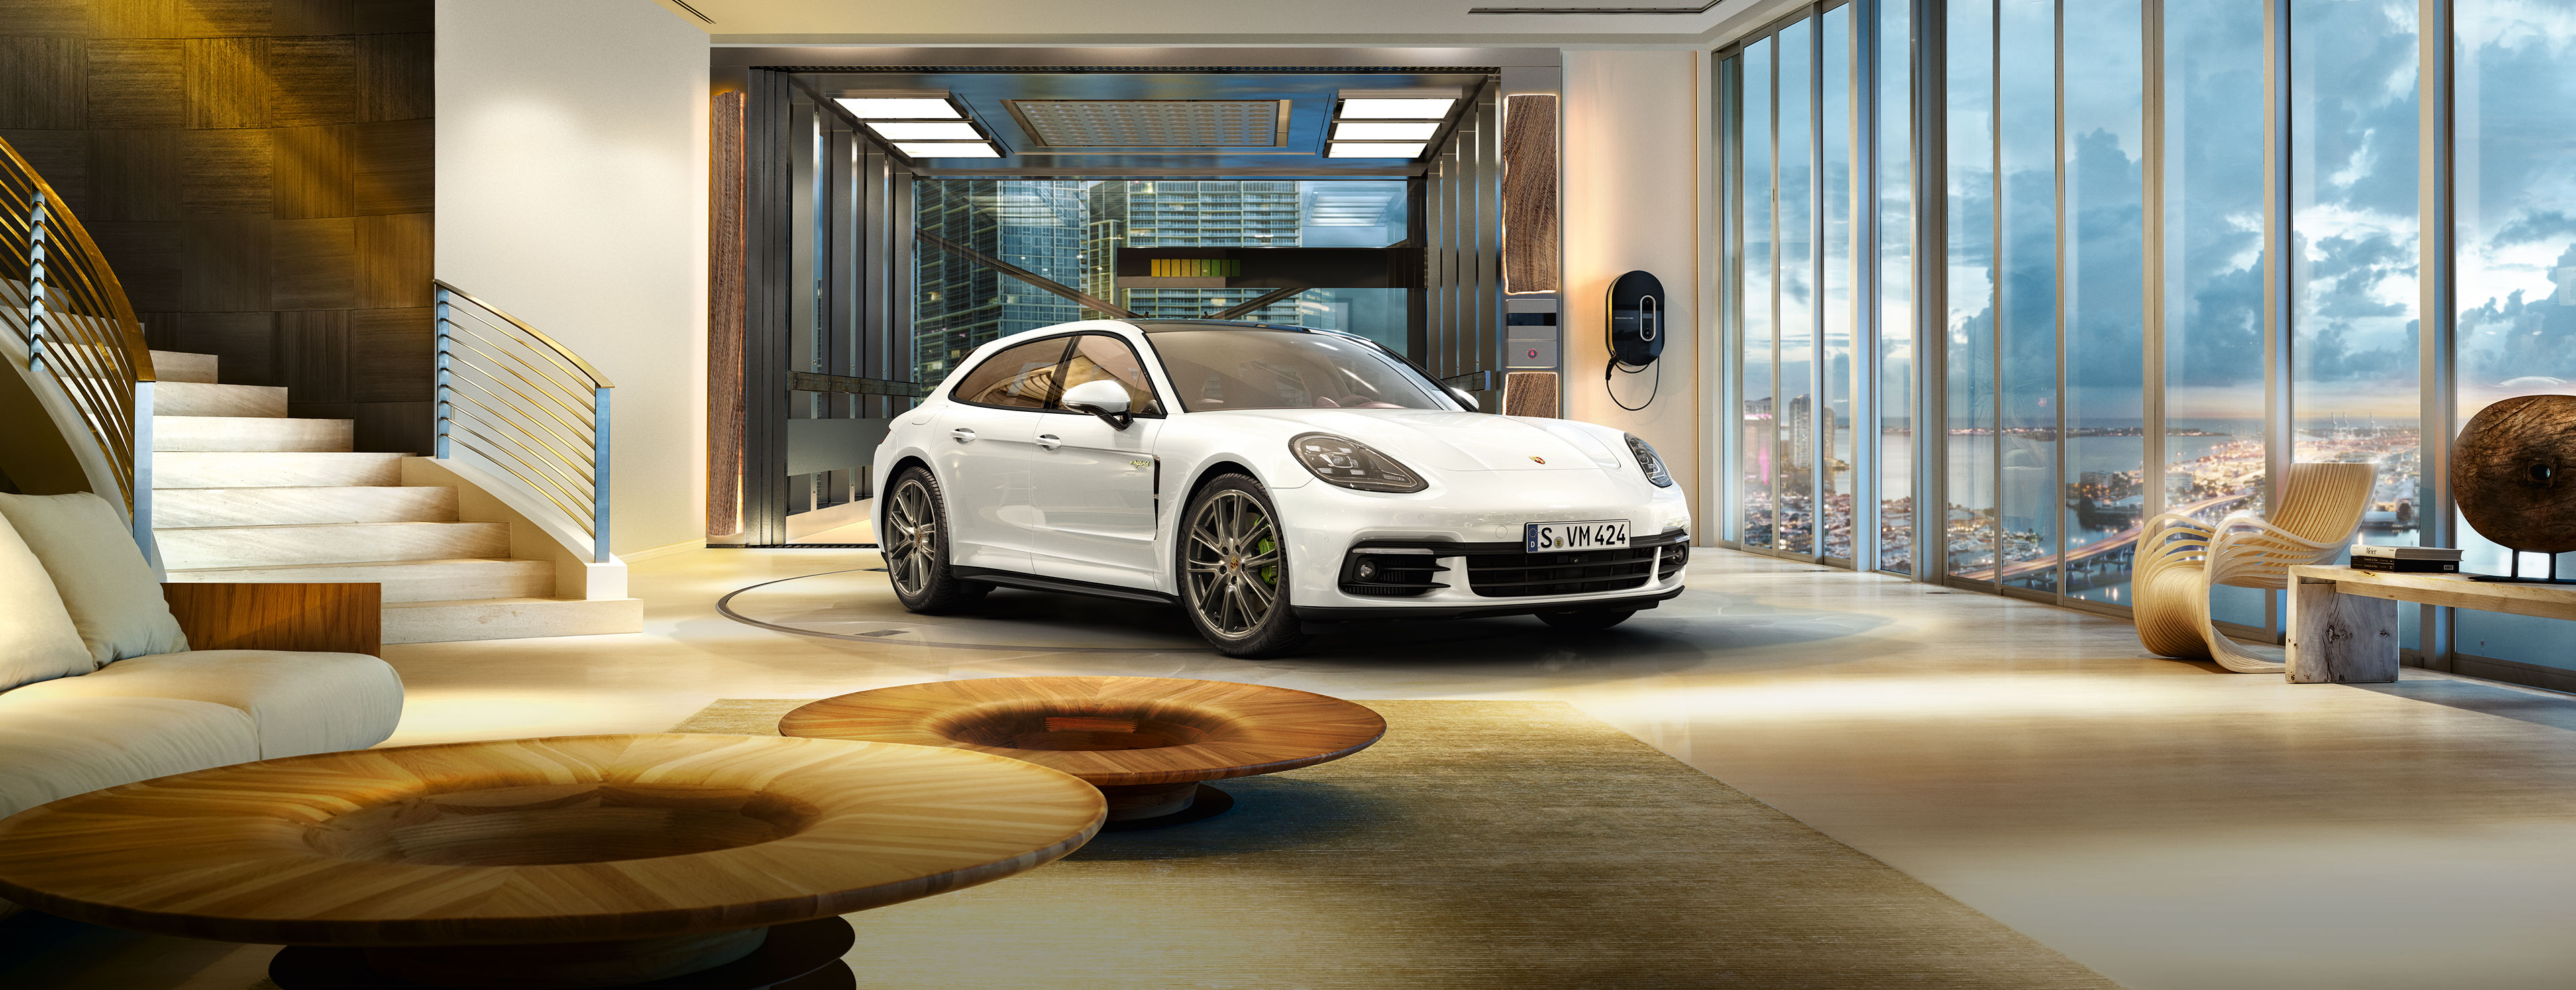 porsche-normal Marvelous Porsche 918 Spyder Hybrid Prezzo Cars Trend